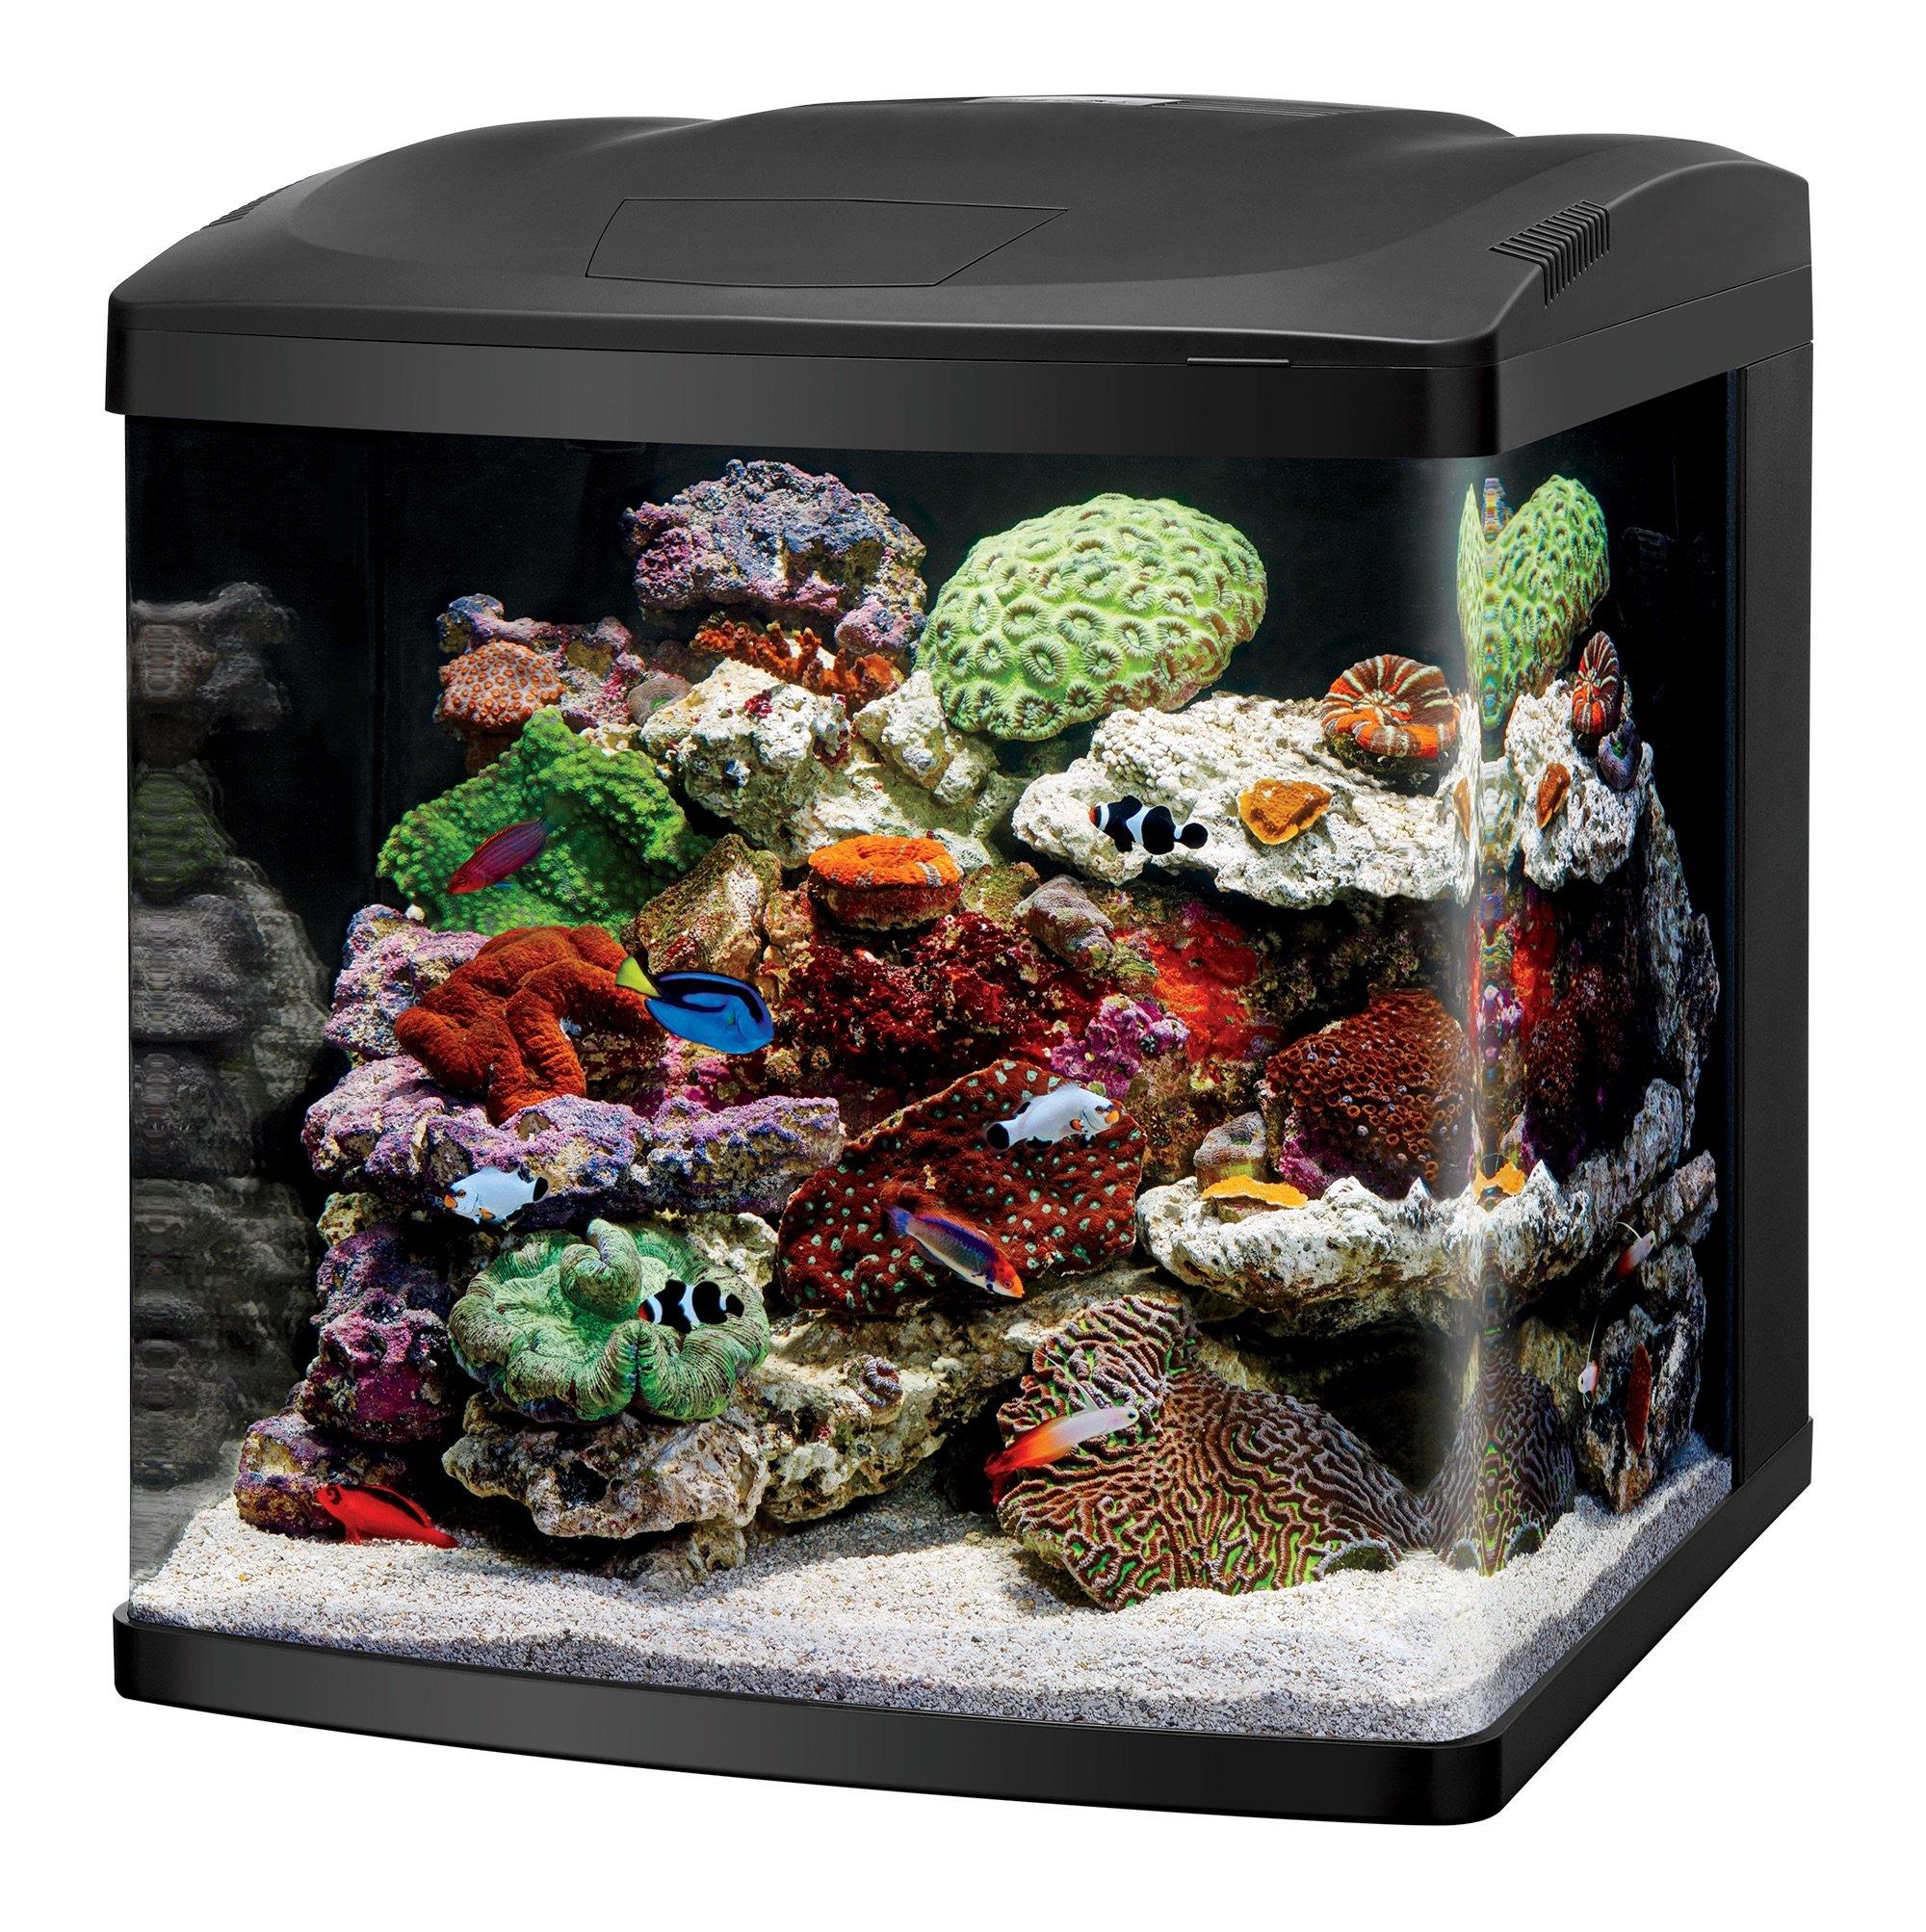 Coralife LED BioCube Aquarium Kit, 32 Gallon by Coralife